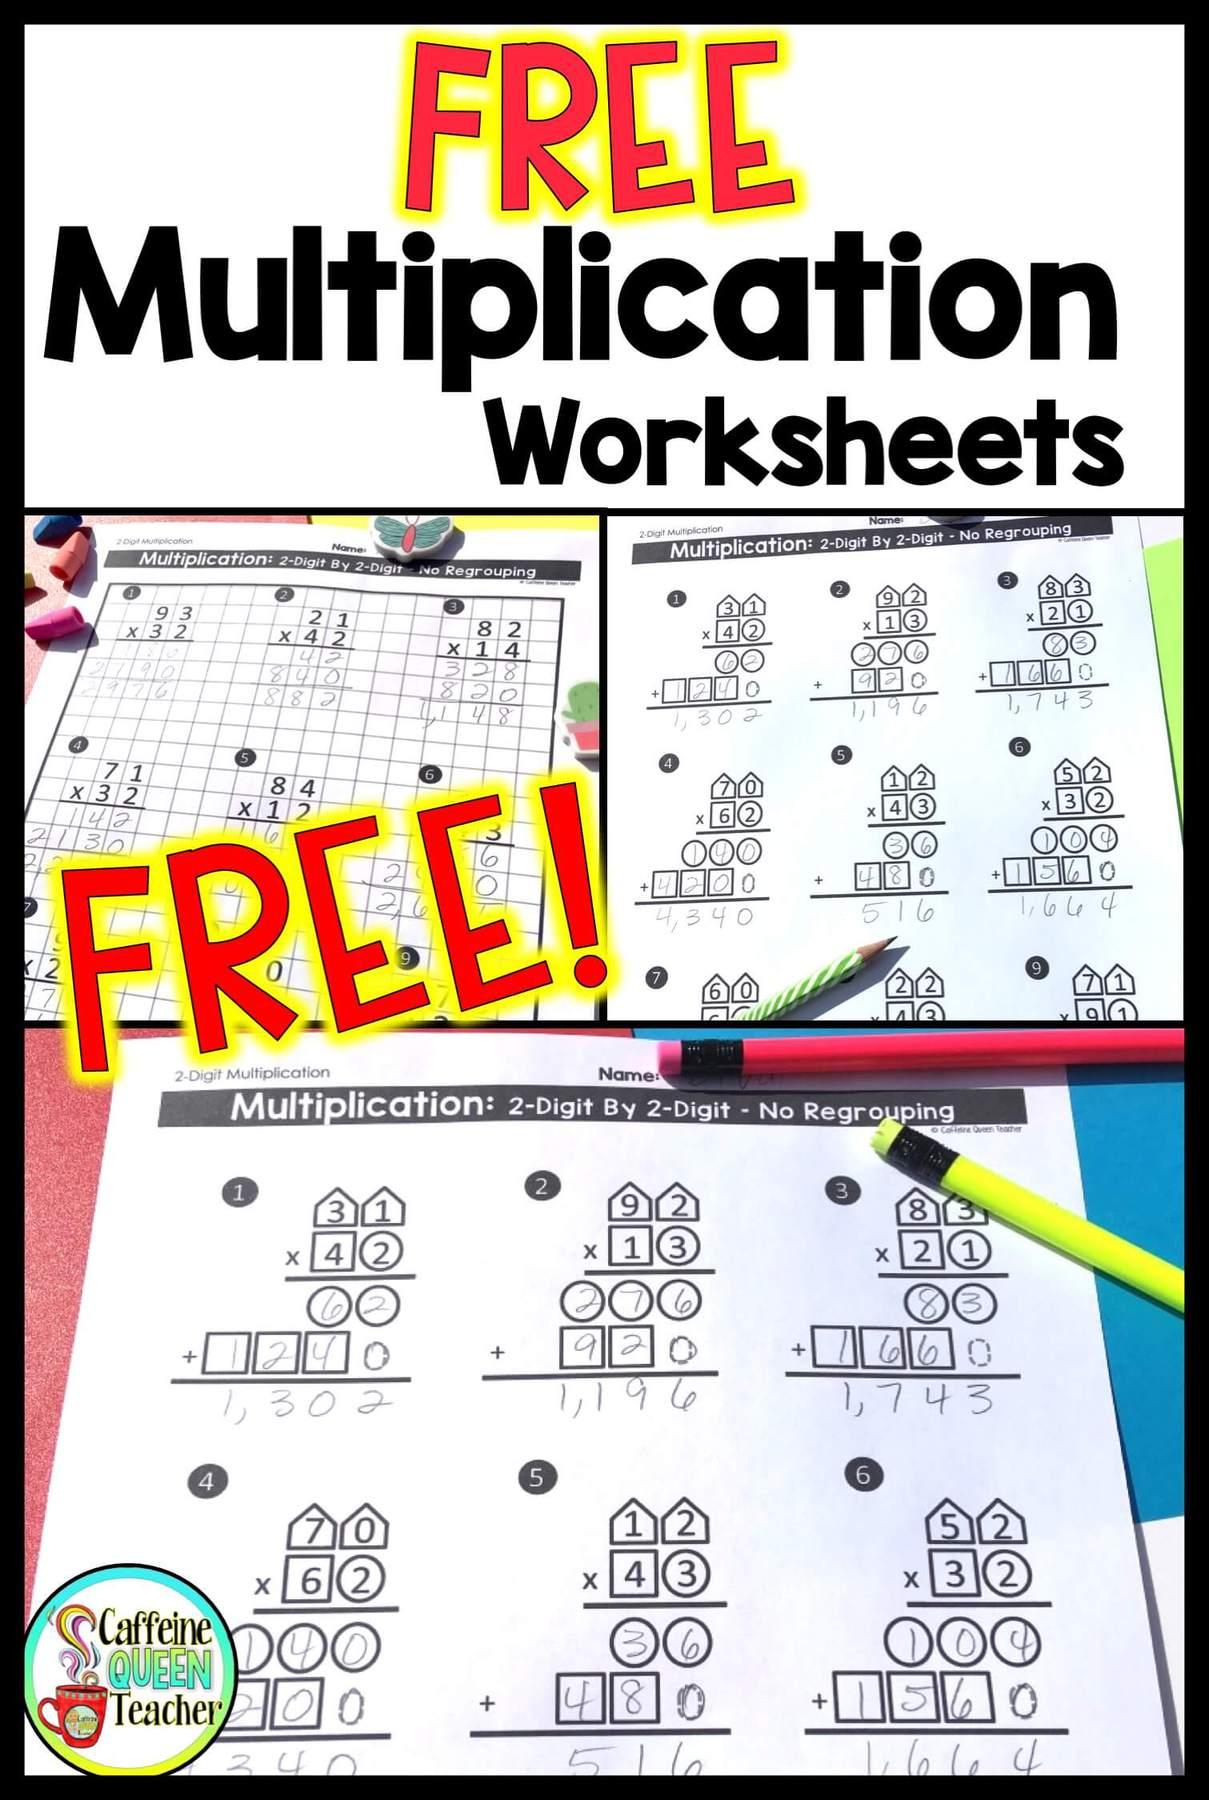 2-Digit Multiplication Worksheets: Differentiated - Caffeine Queen Teacher [ 1800 x 1209 Pixel ]